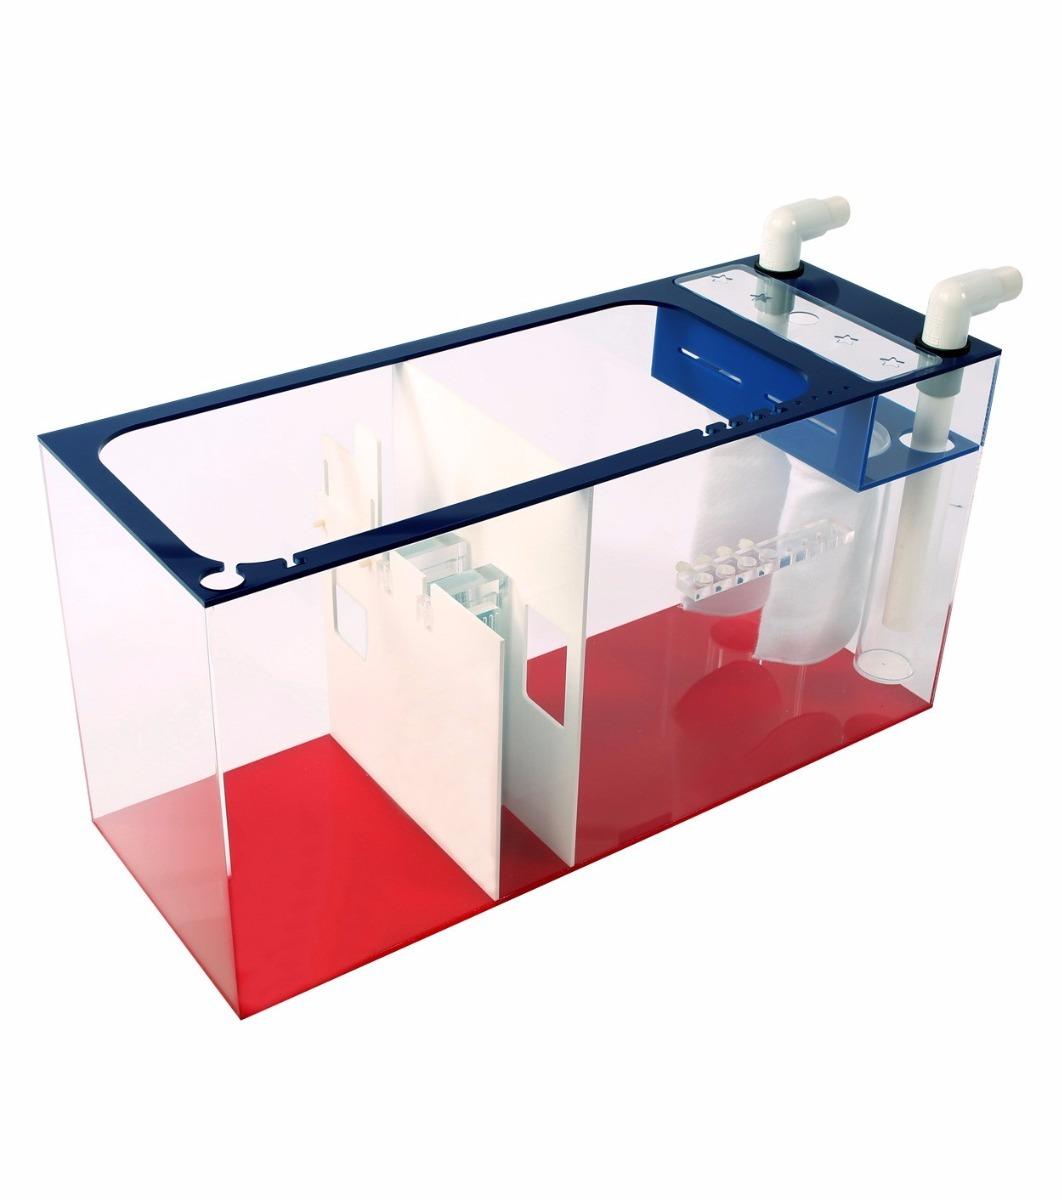 Sump acr lico acuario marino 4 en mercado libre for Accesorios para acuarios marinos